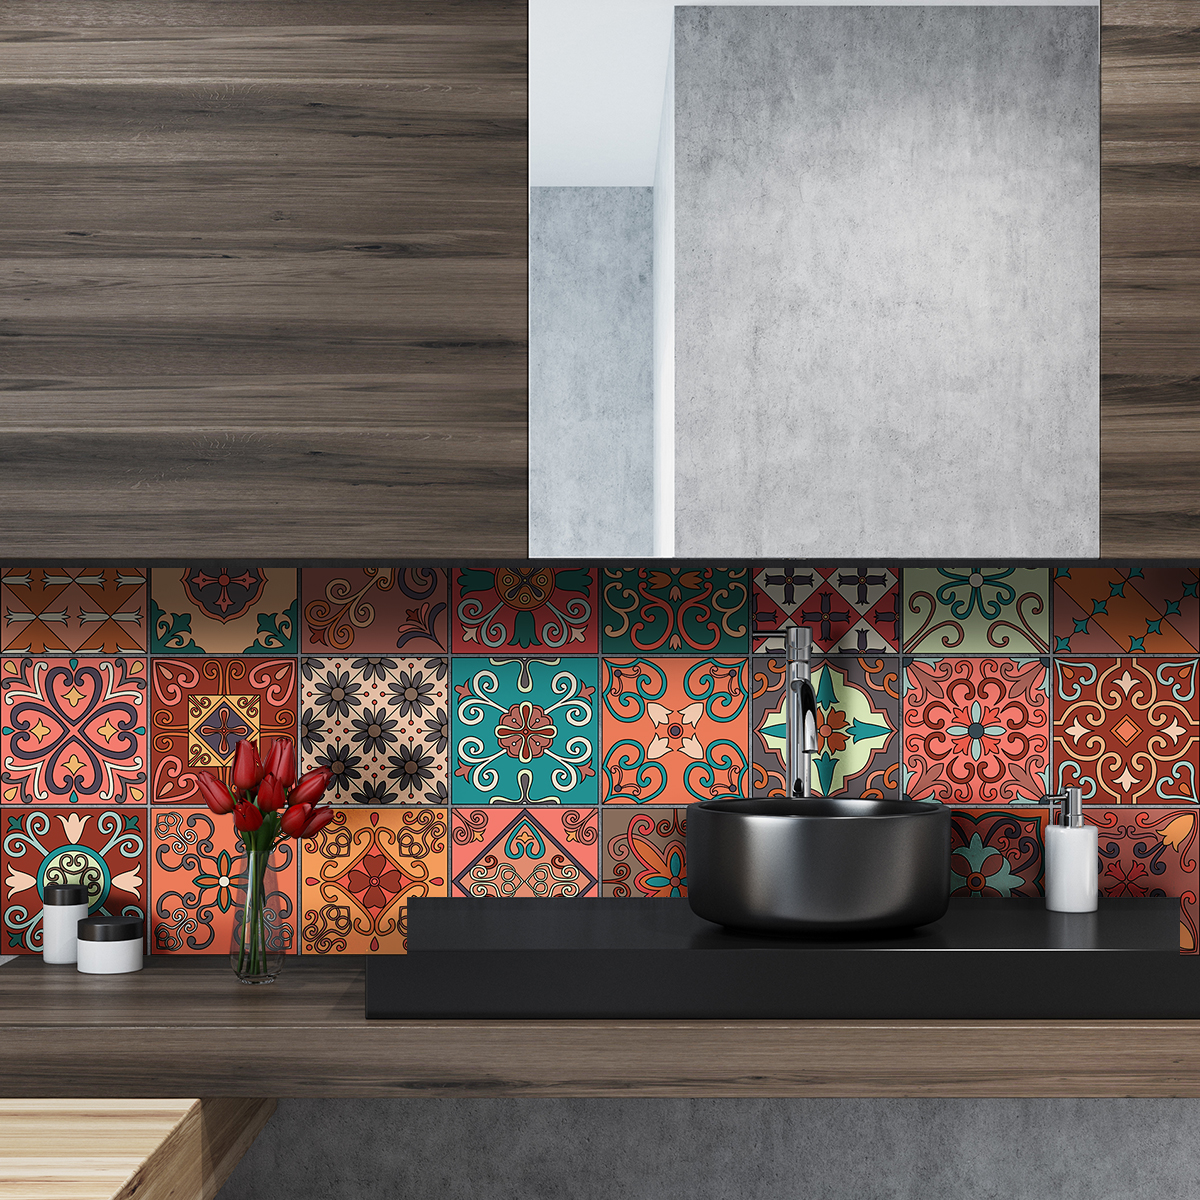 24 stickers carreaux de ciment azulejos giordano cuisine carrelages ambiance sticker. Black Bedroom Furniture Sets. Home Design Ideas